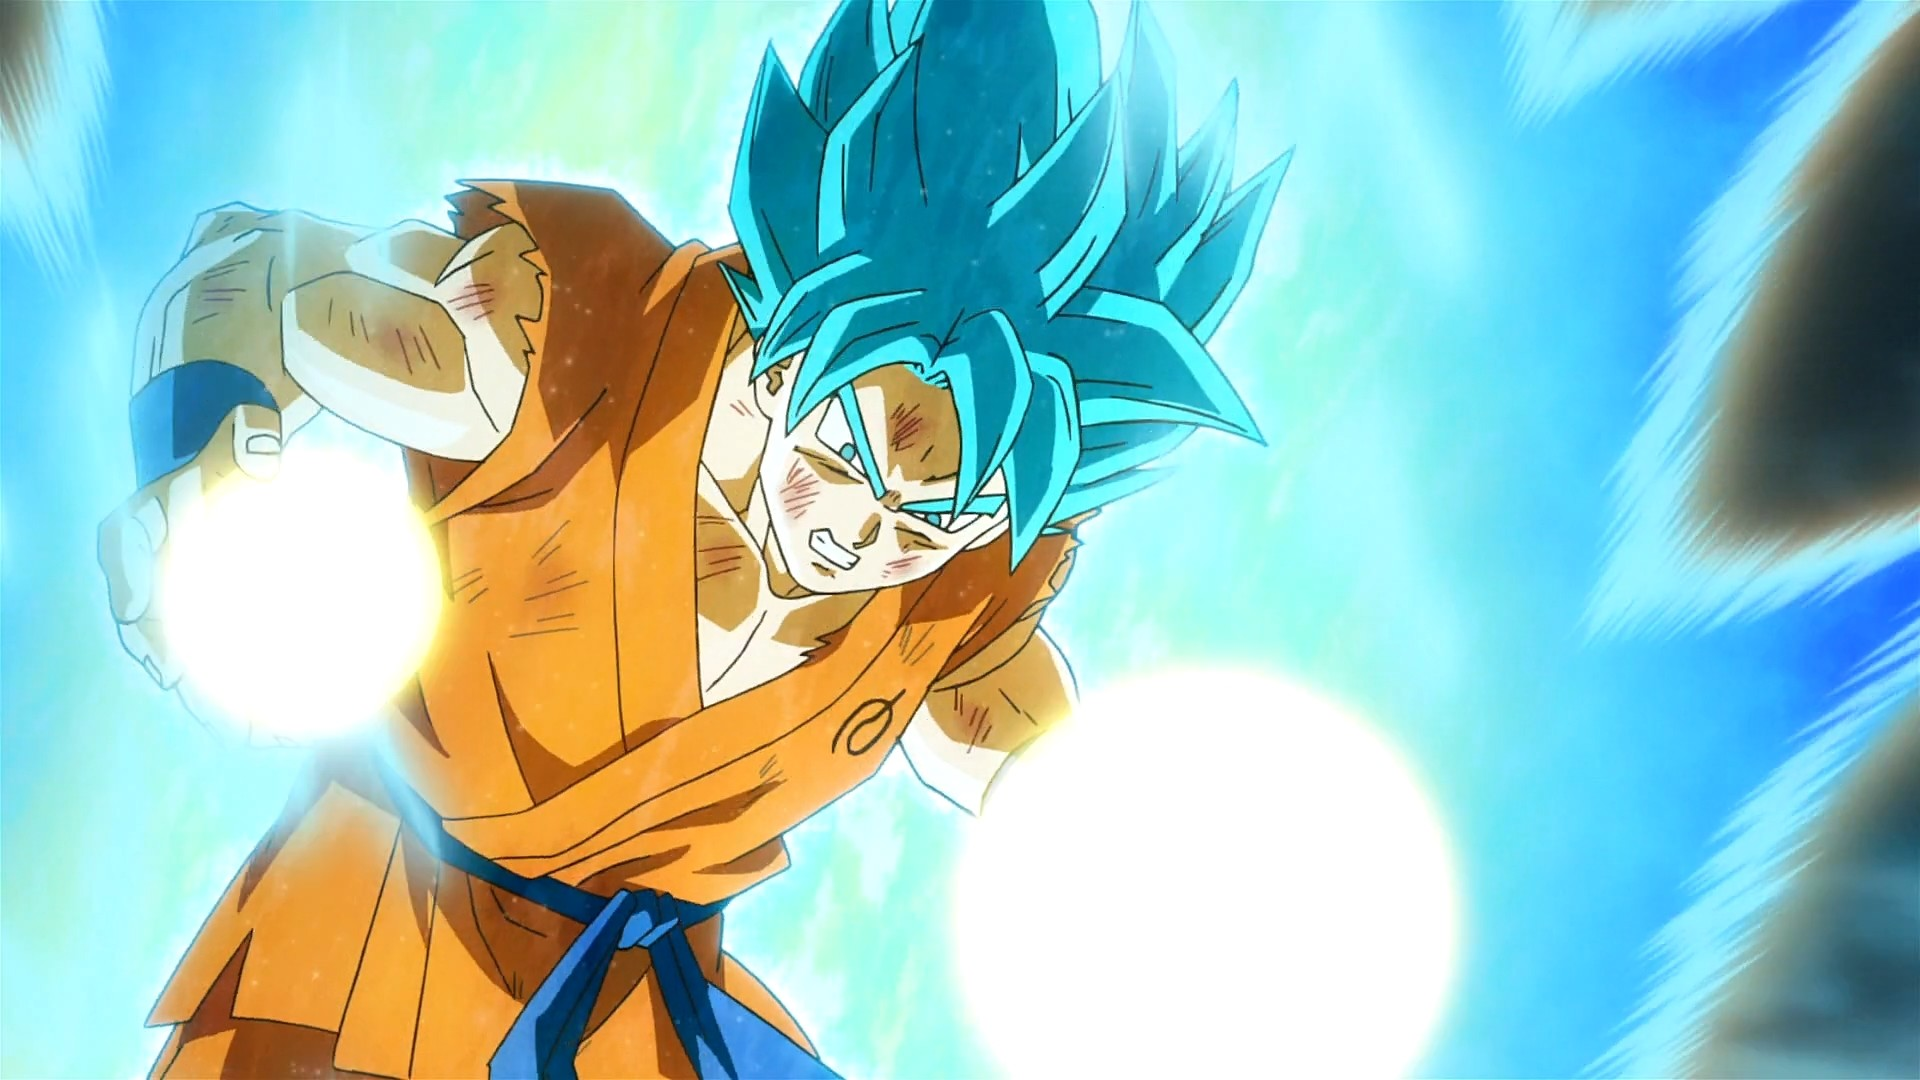 1920x1080 Son Goku Super Saiyan GOD Blue Wallpapers Download Available Downloads